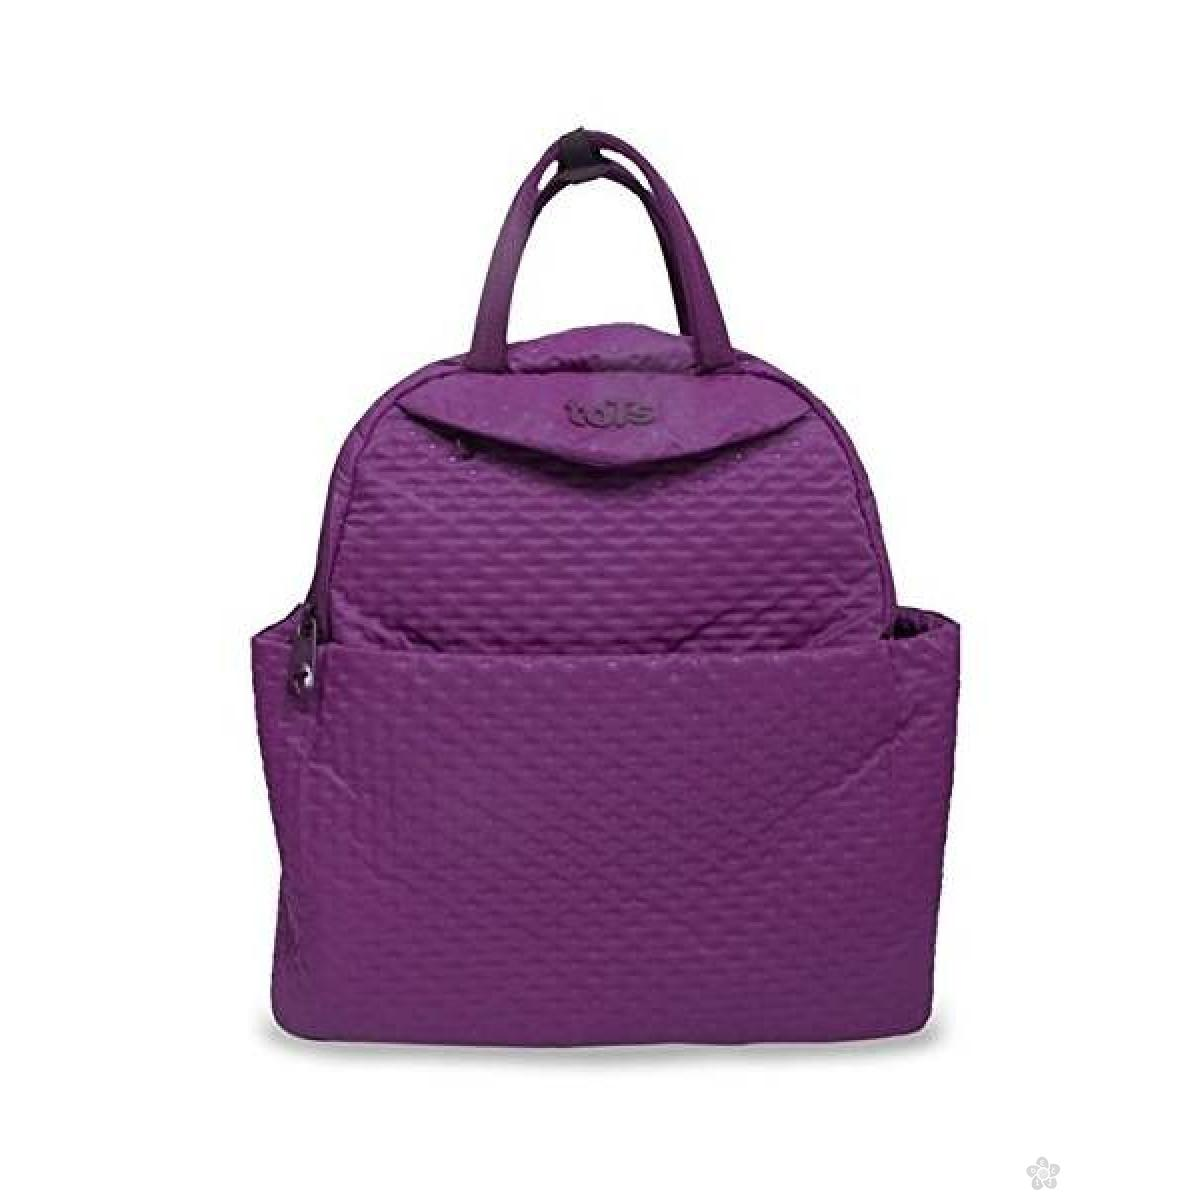 Tots Infinity Torba za Mame Purple Quilt